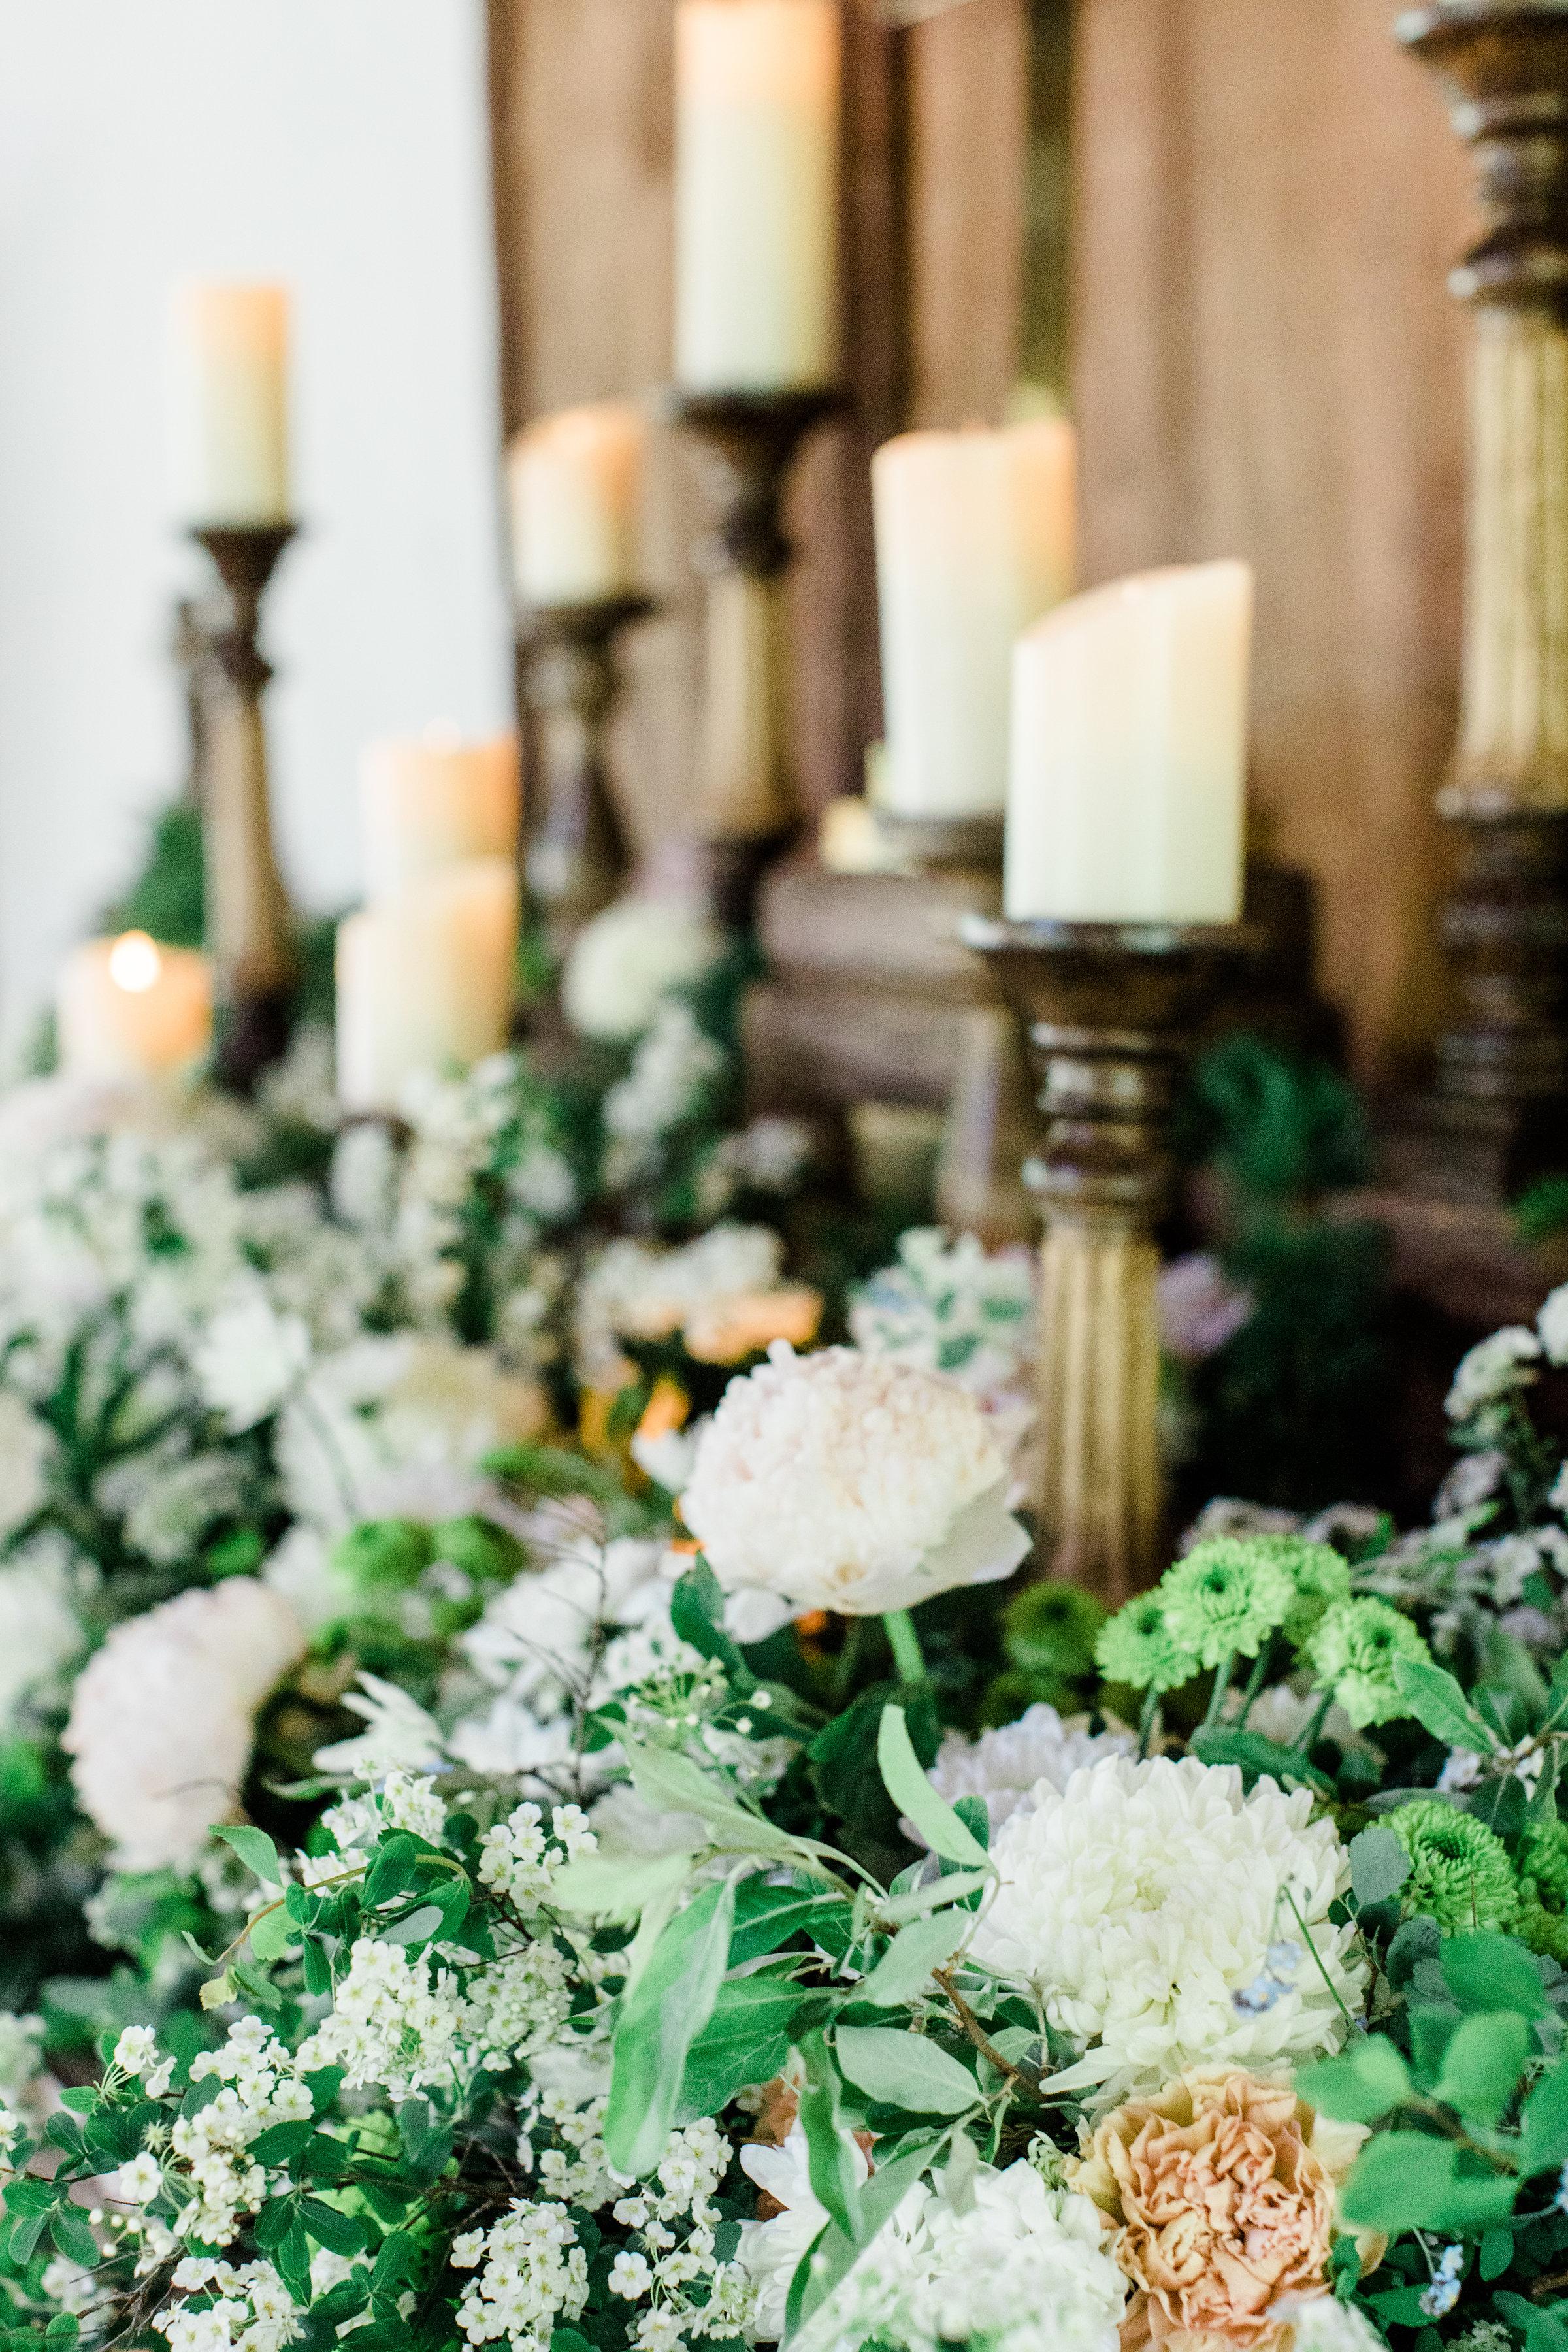 Coffman+Wedding+Ceremony+Details-13.jpg